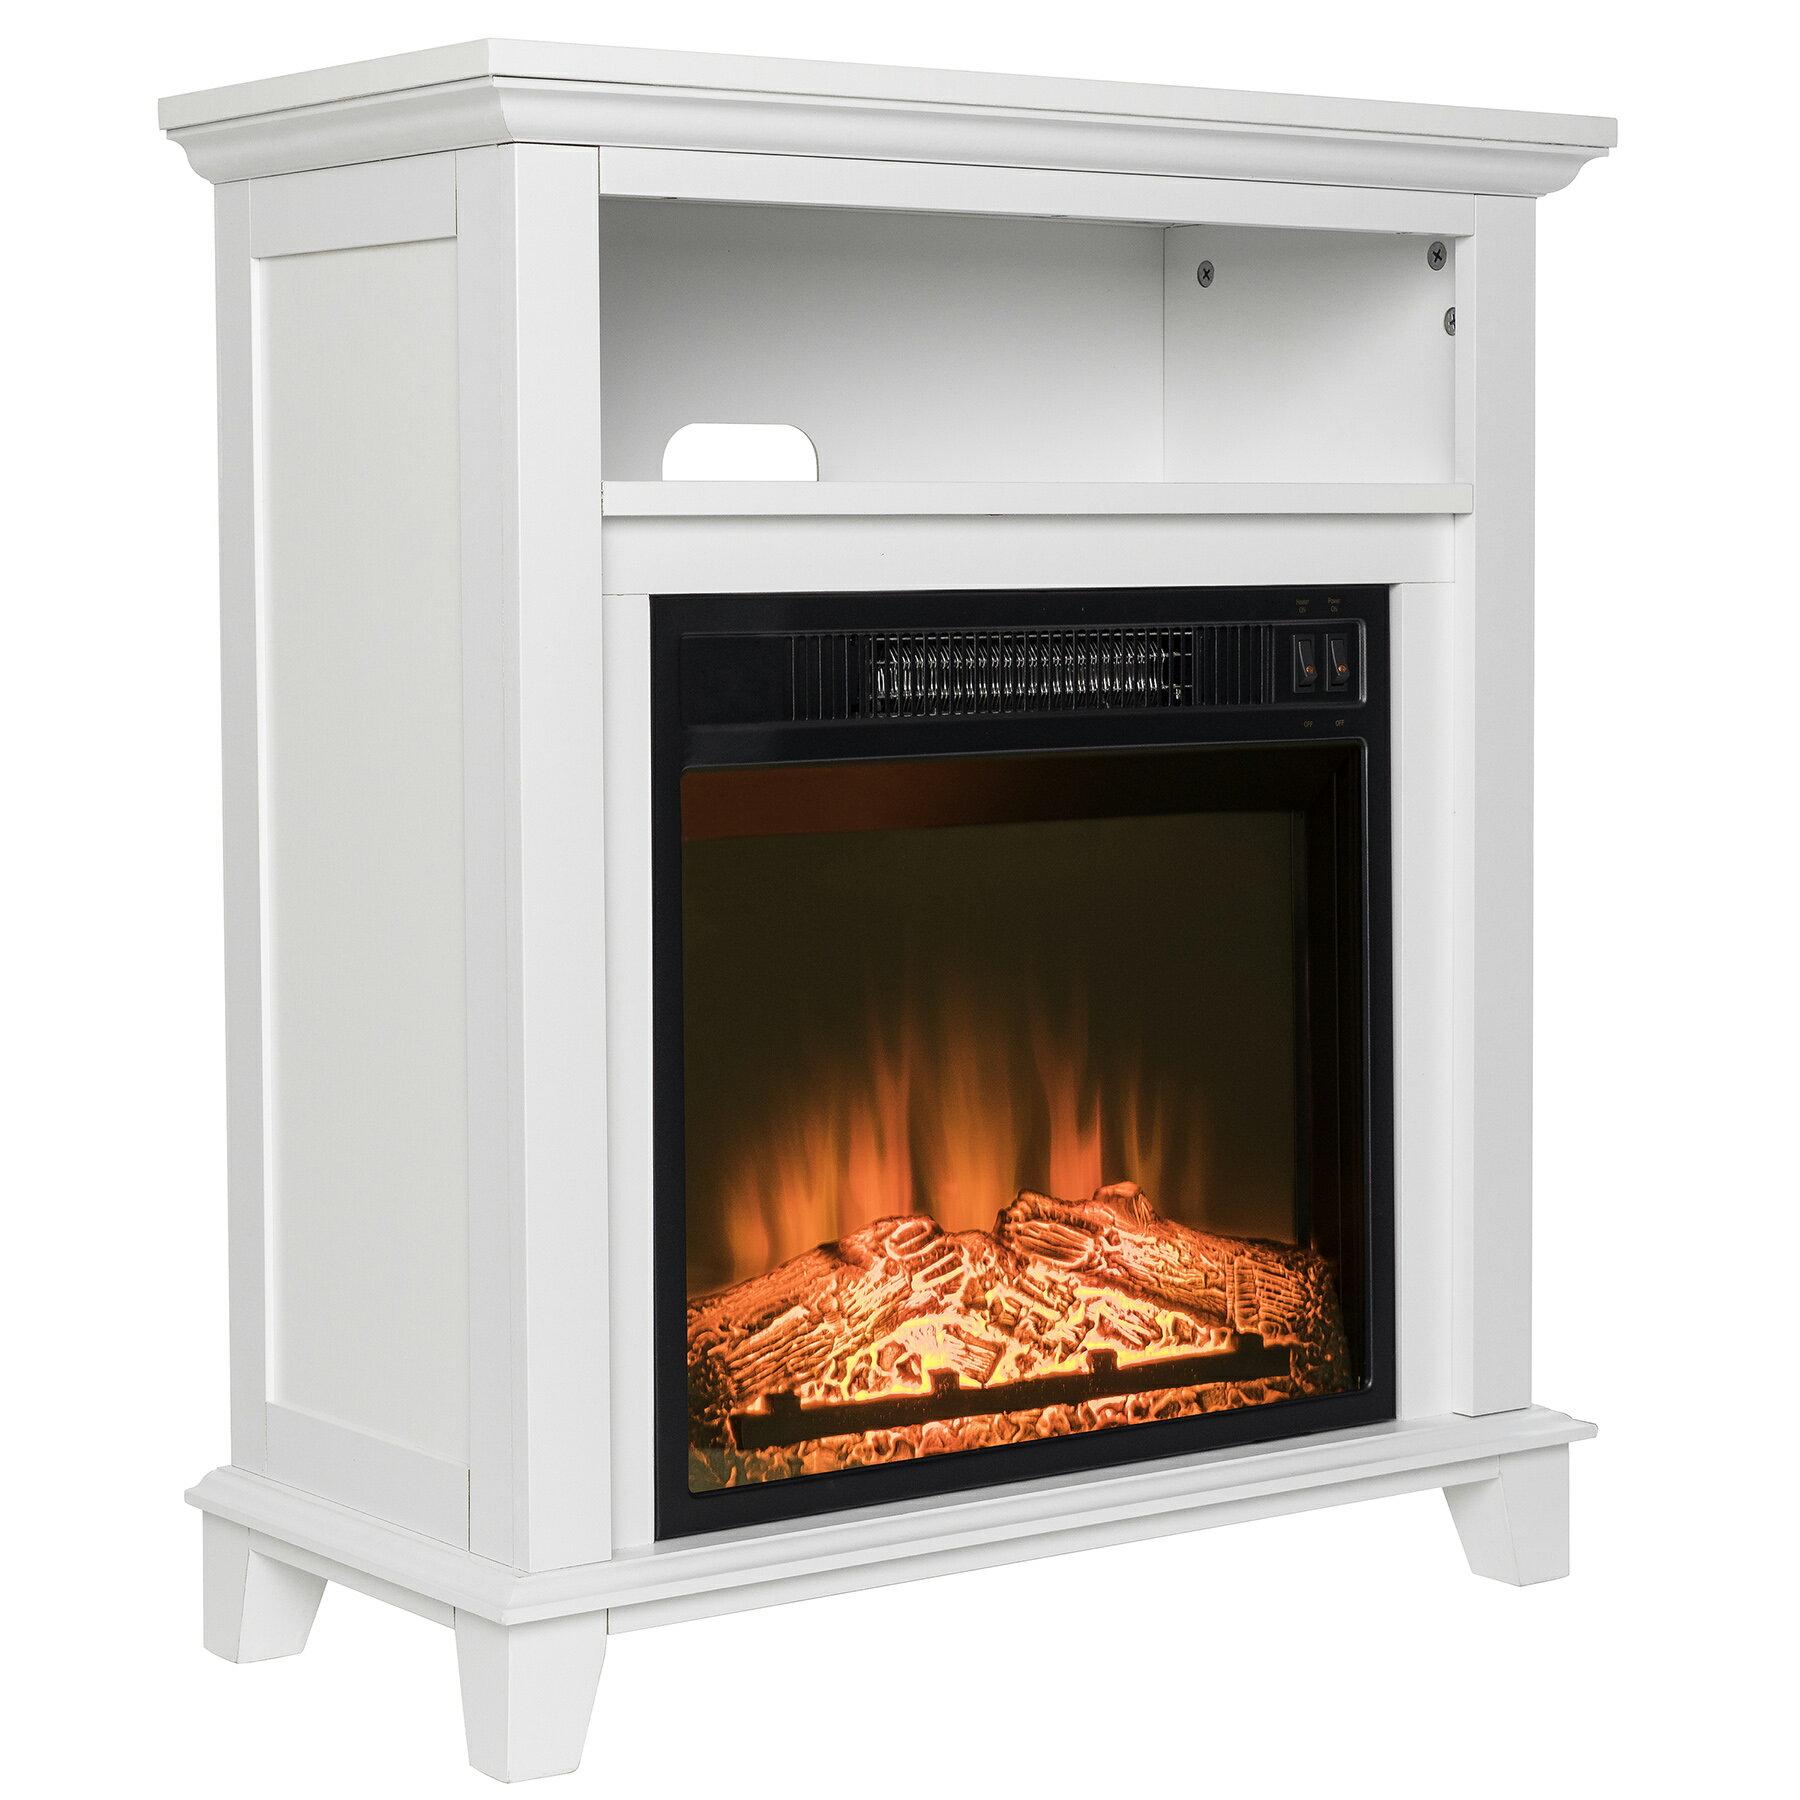 Akdy White Wooden Mantel Shelf Freestanding Electric Fireplace Stove Heater 2